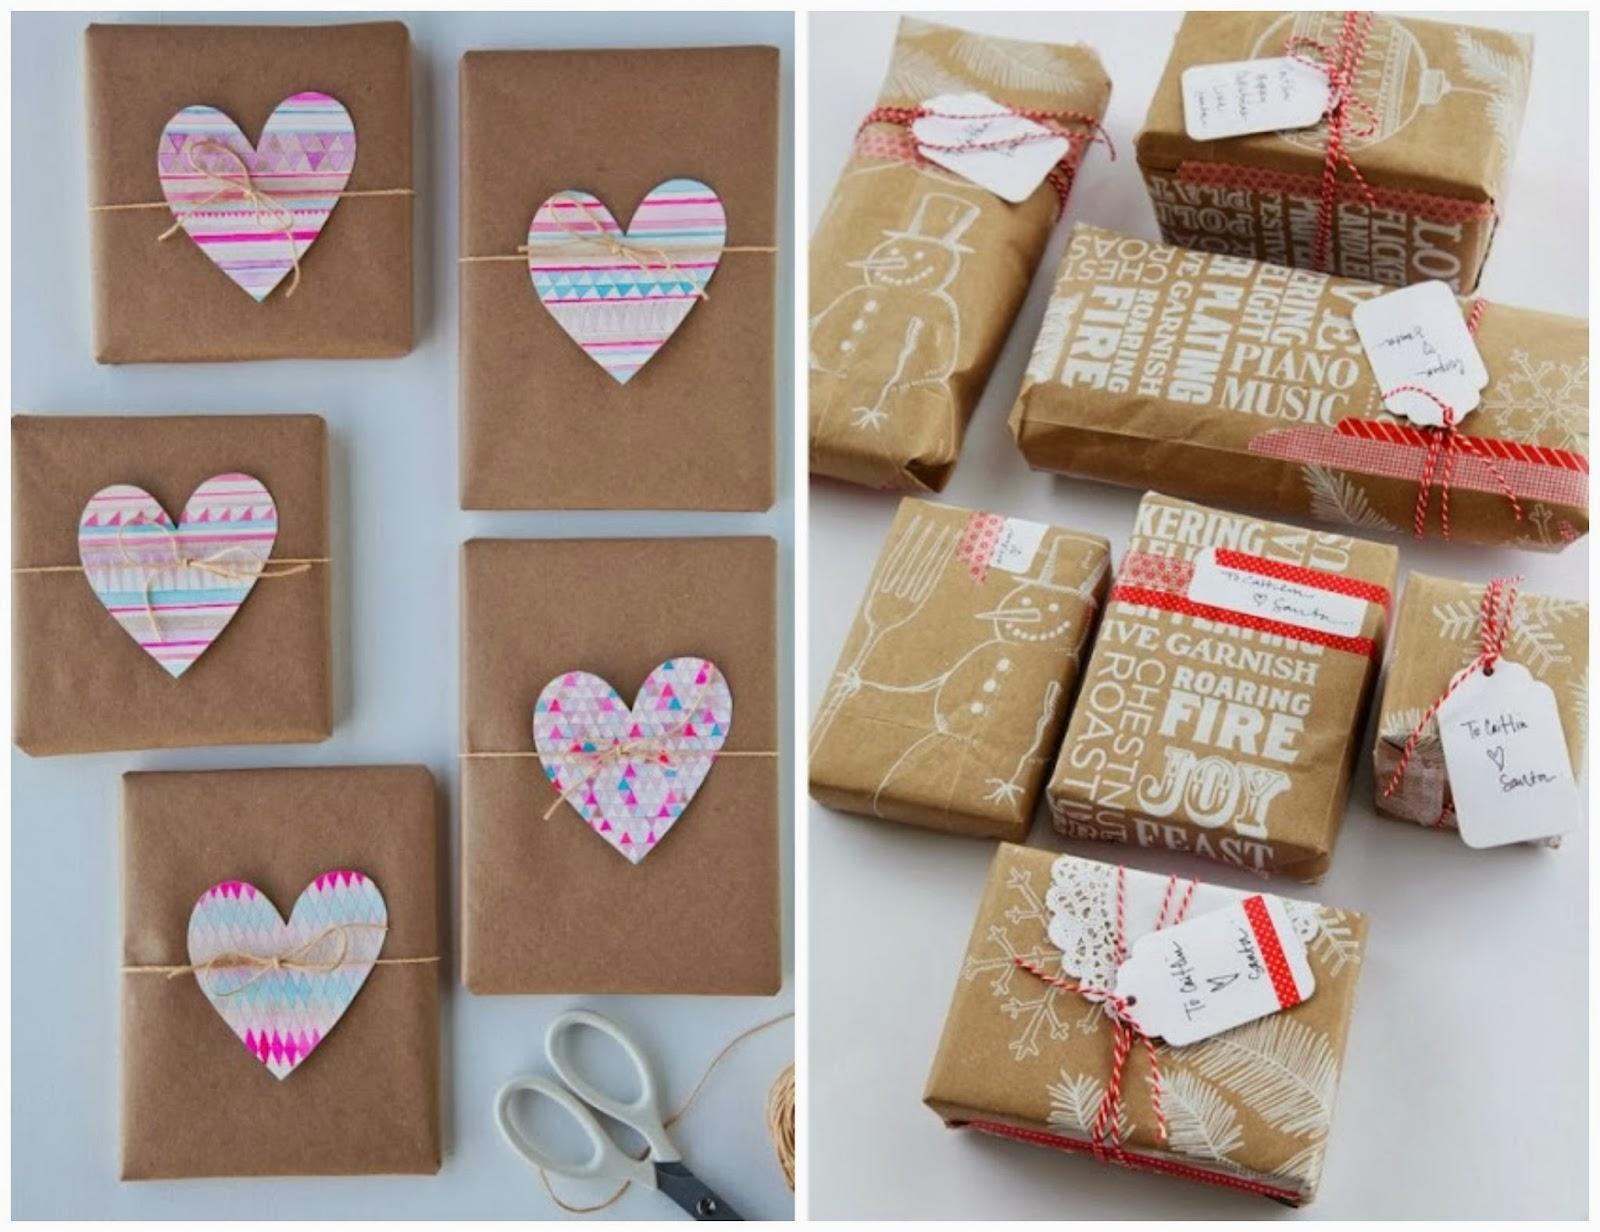 natal-presente-embalagem-papel-craft-coraoces-carimbo-barbante